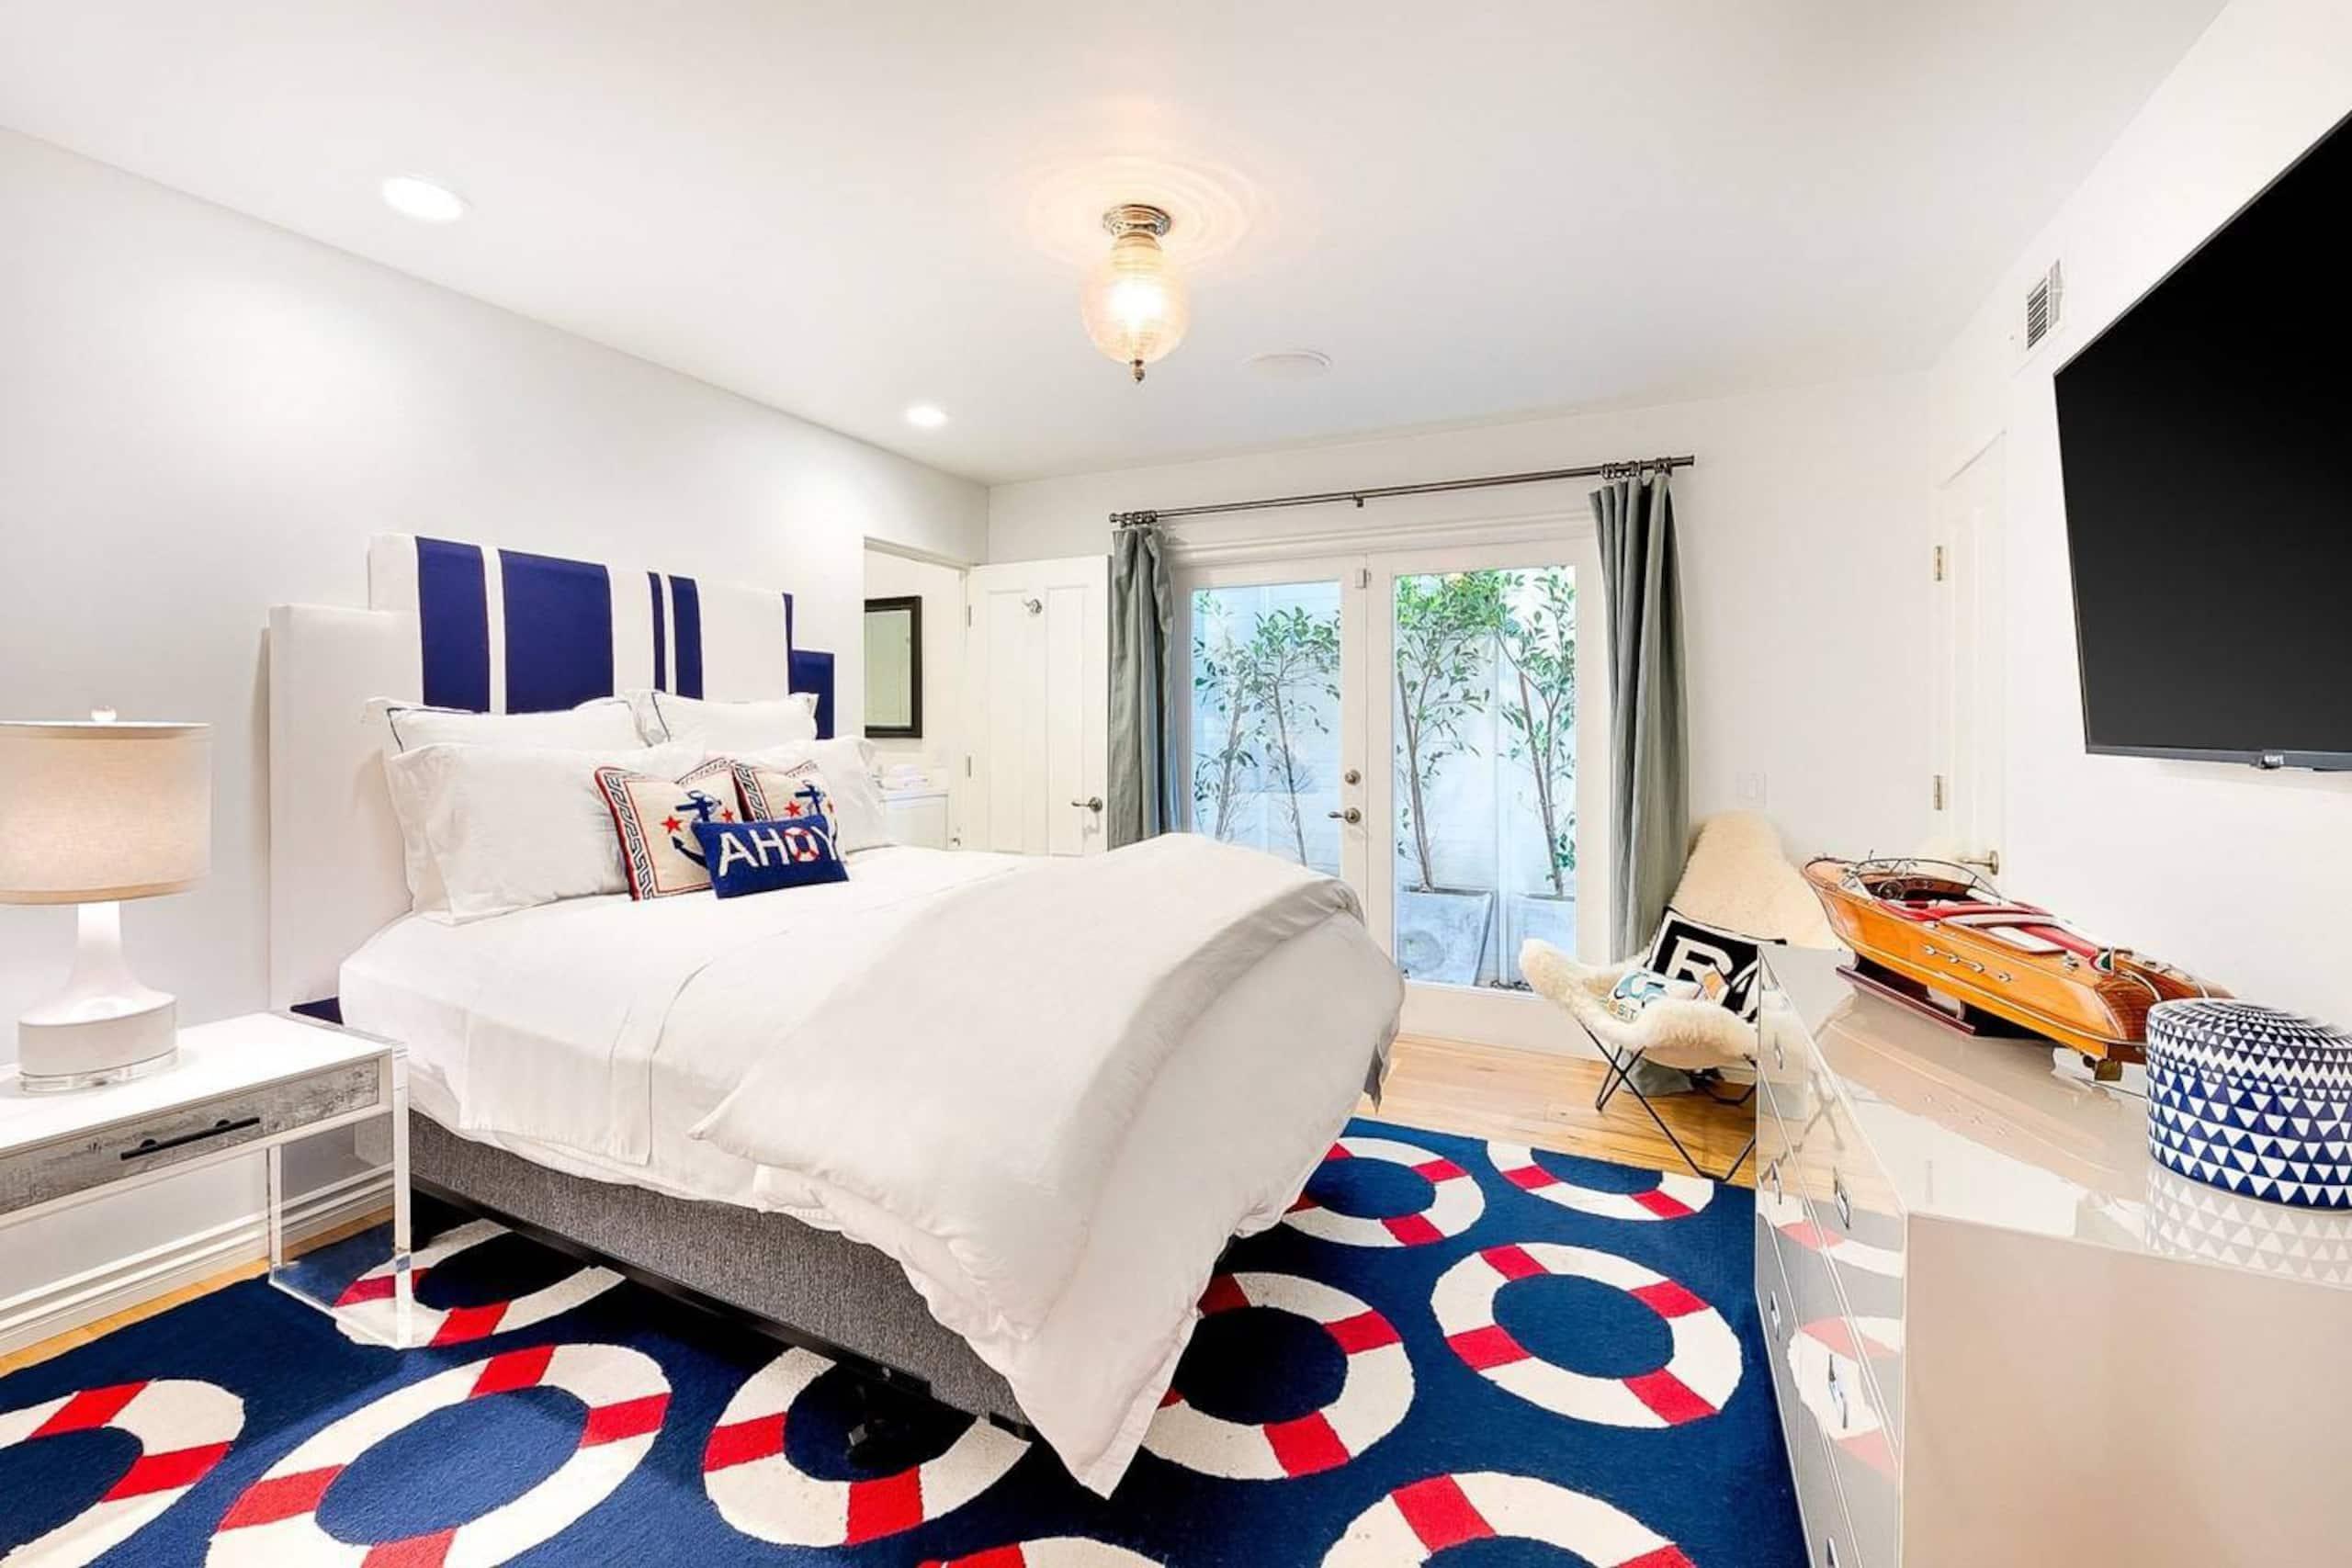 Apartment Villa Shawaiz - Beachfront Villa with 5 beds  photo 20414921